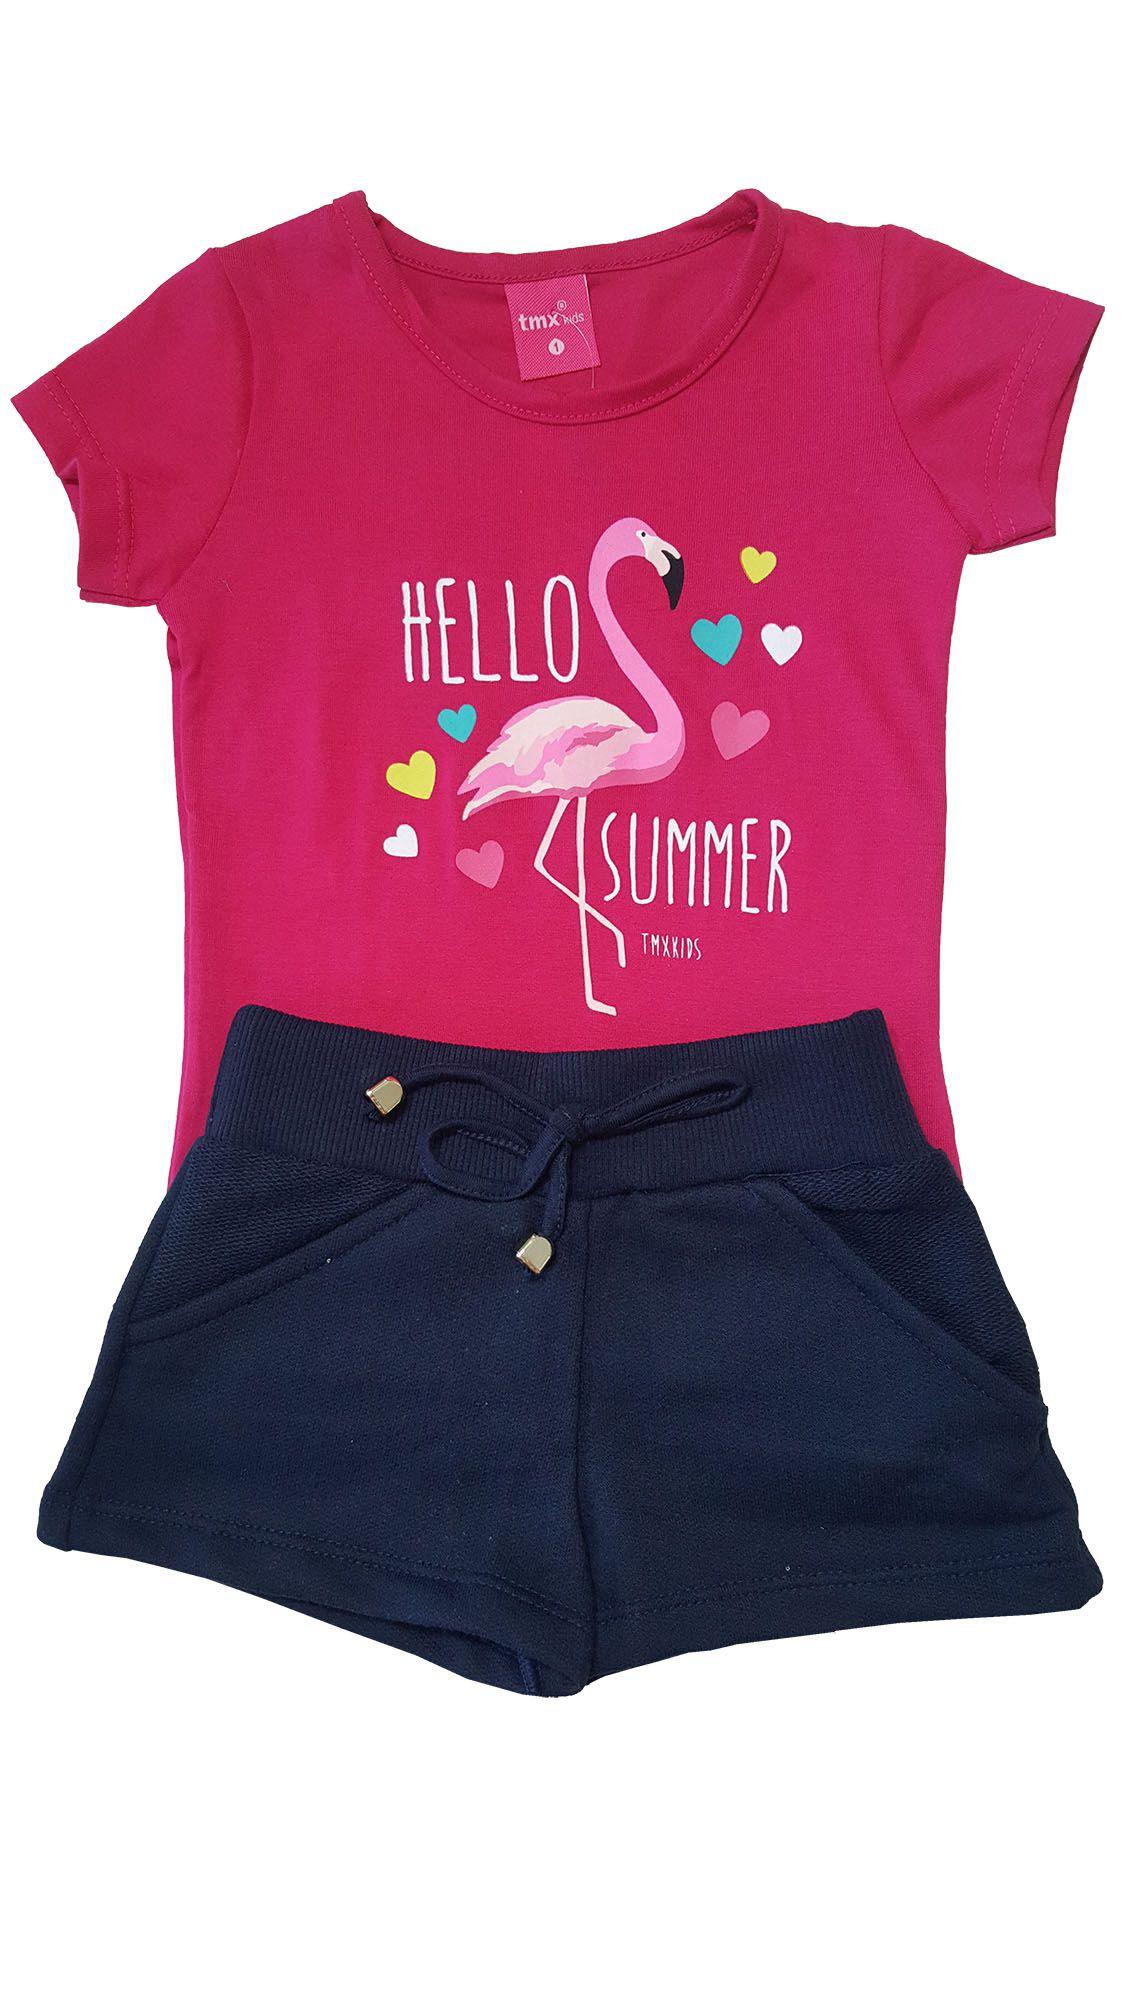 Conjunto Infantil Blusa e Shorts TMX  Hello Summer PinK/Marinho